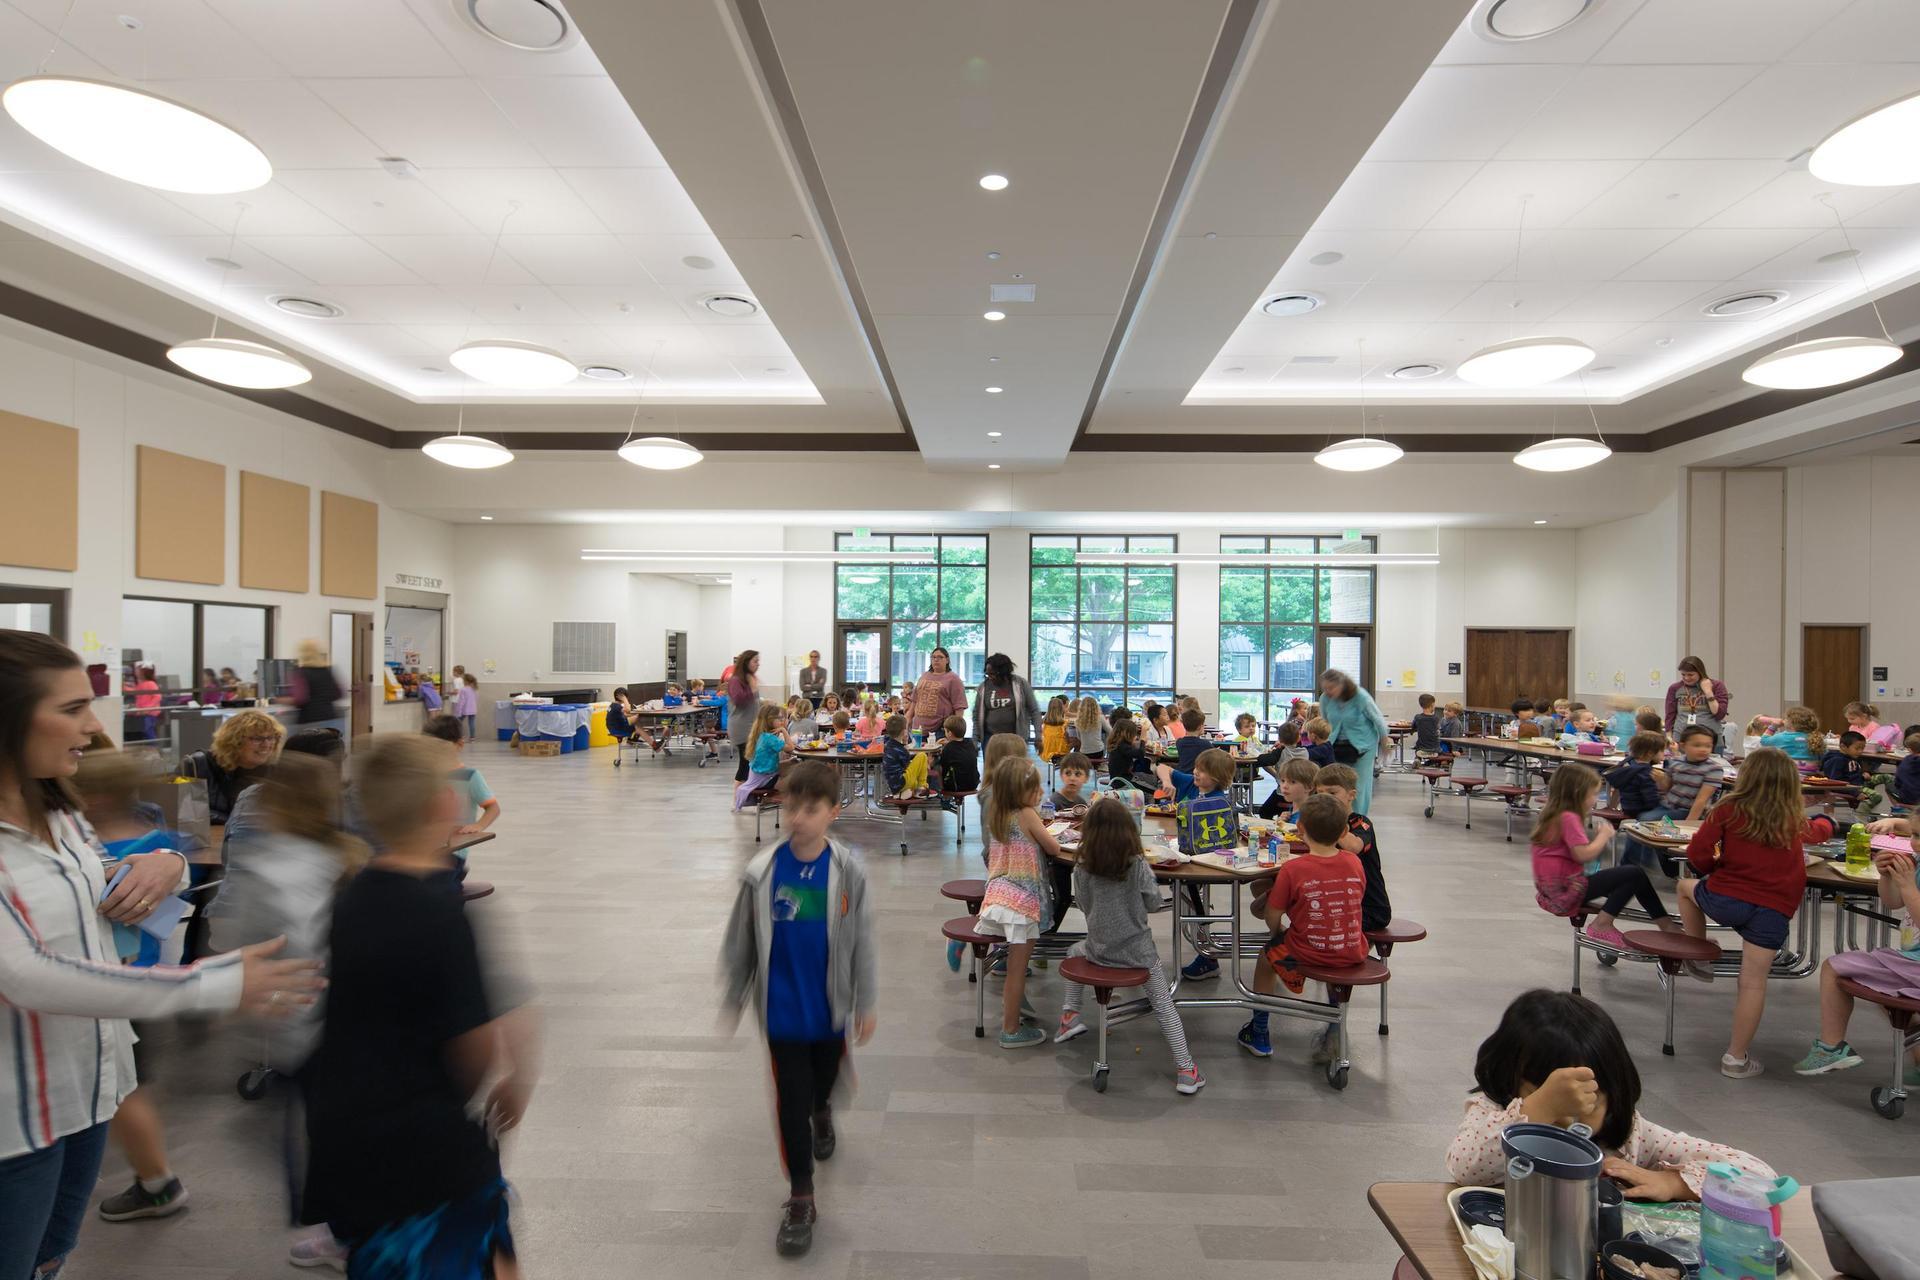 University Park Elementary School